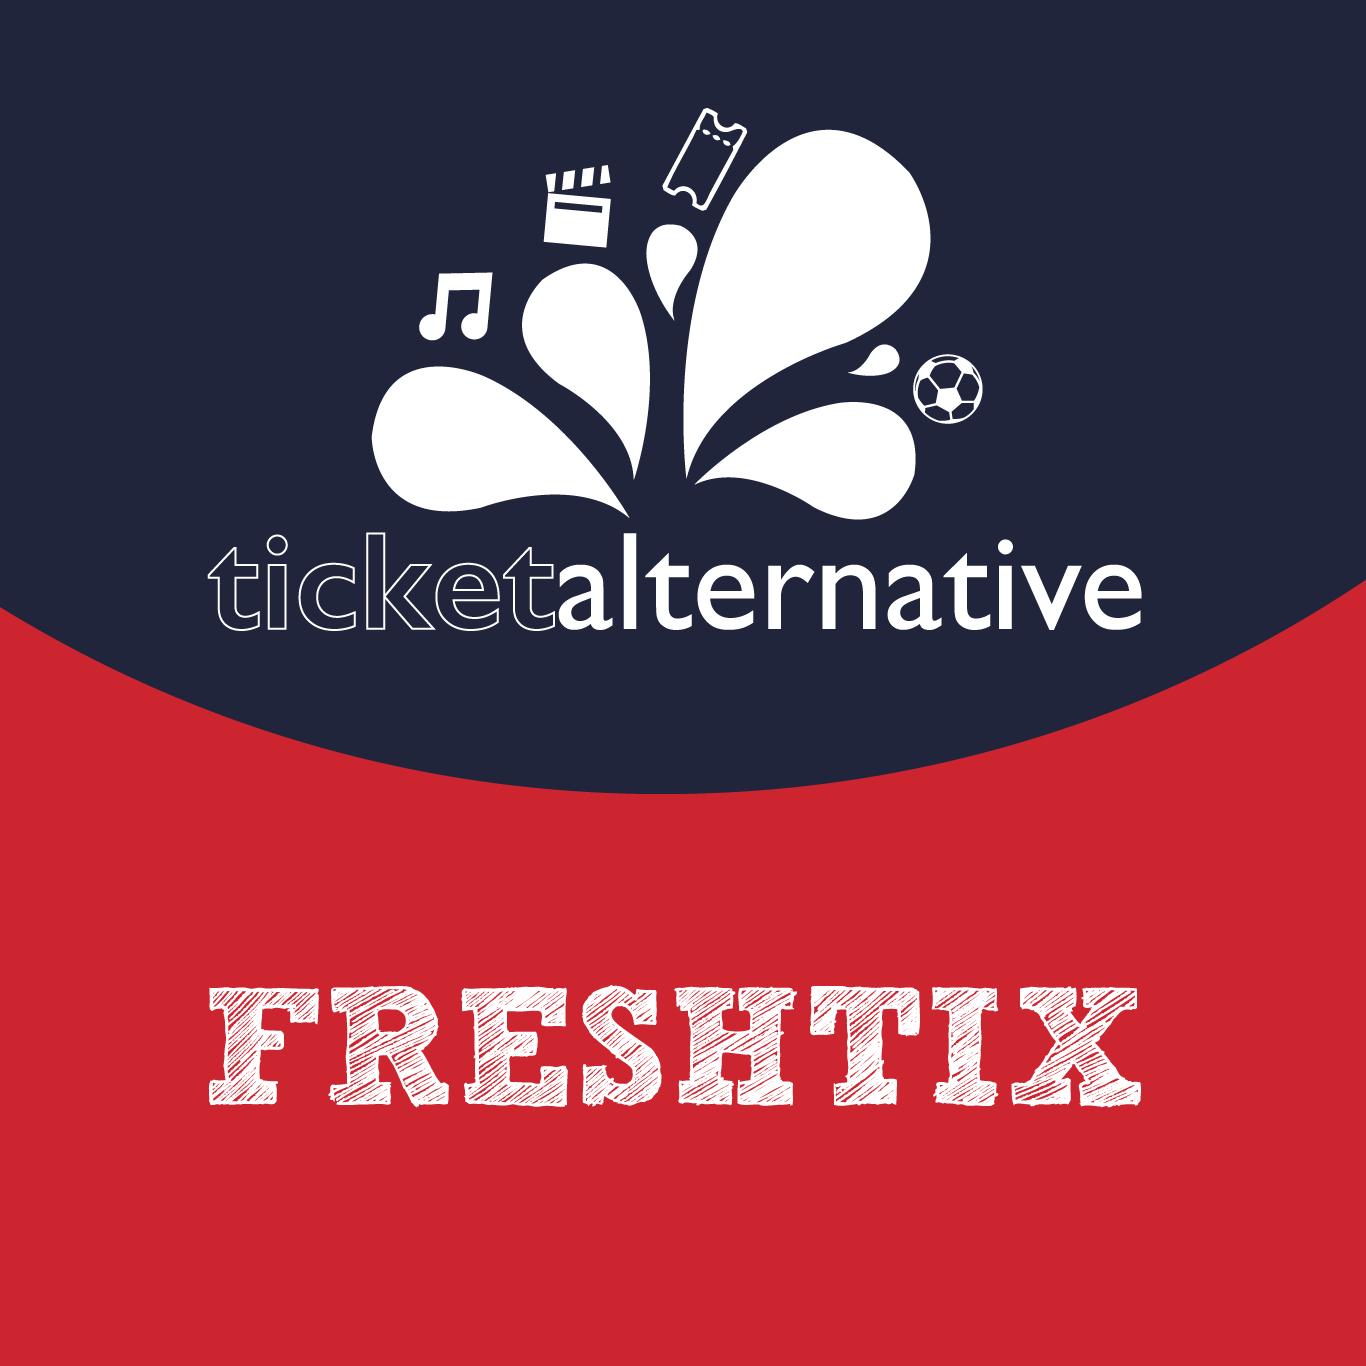 Ticket Alternative & Freshtix